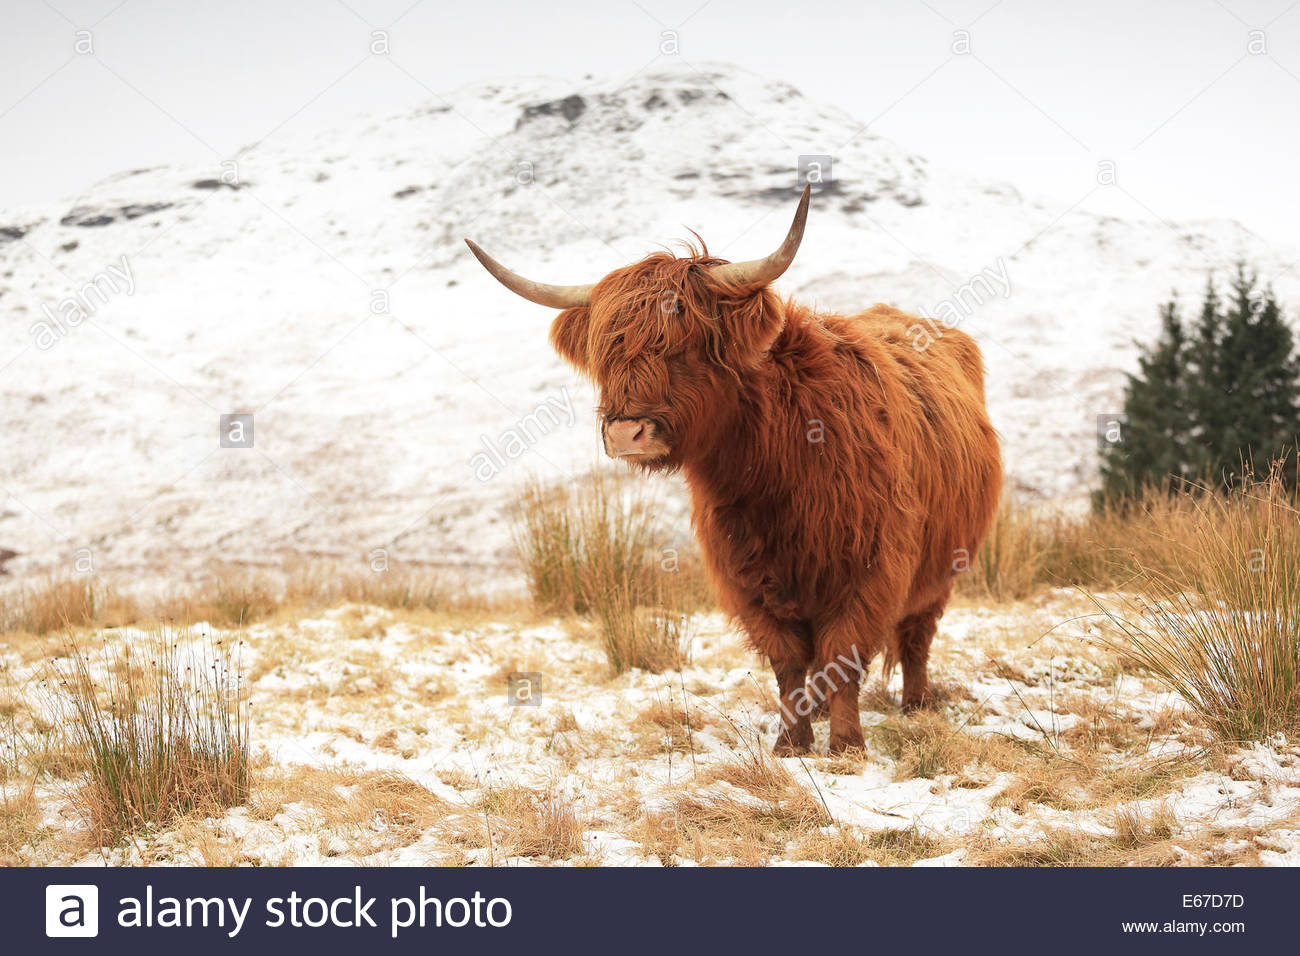 Highland Cow on a snow covered Scottish highland landscape - Stock Image